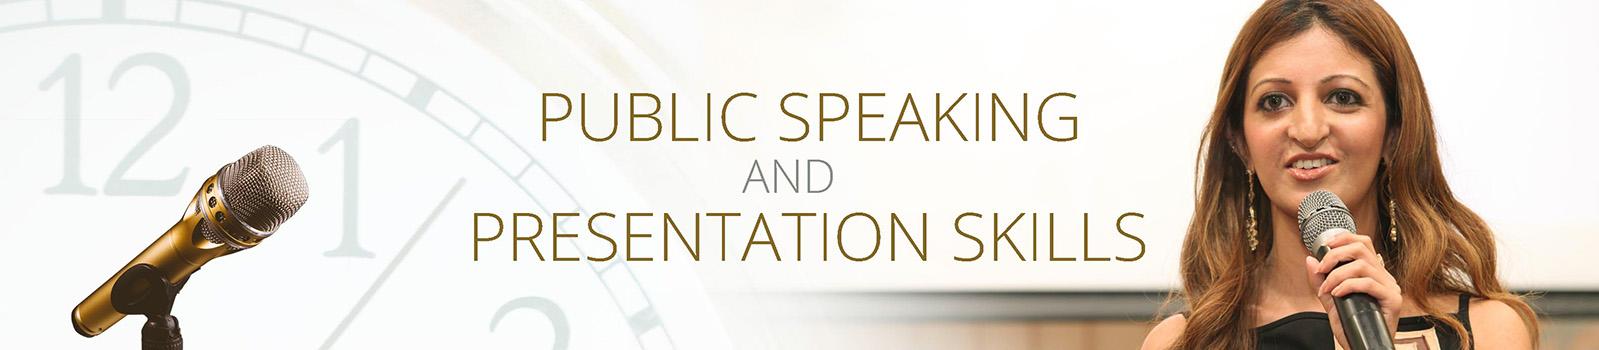 Public Speaking and Presentation Skills Banner